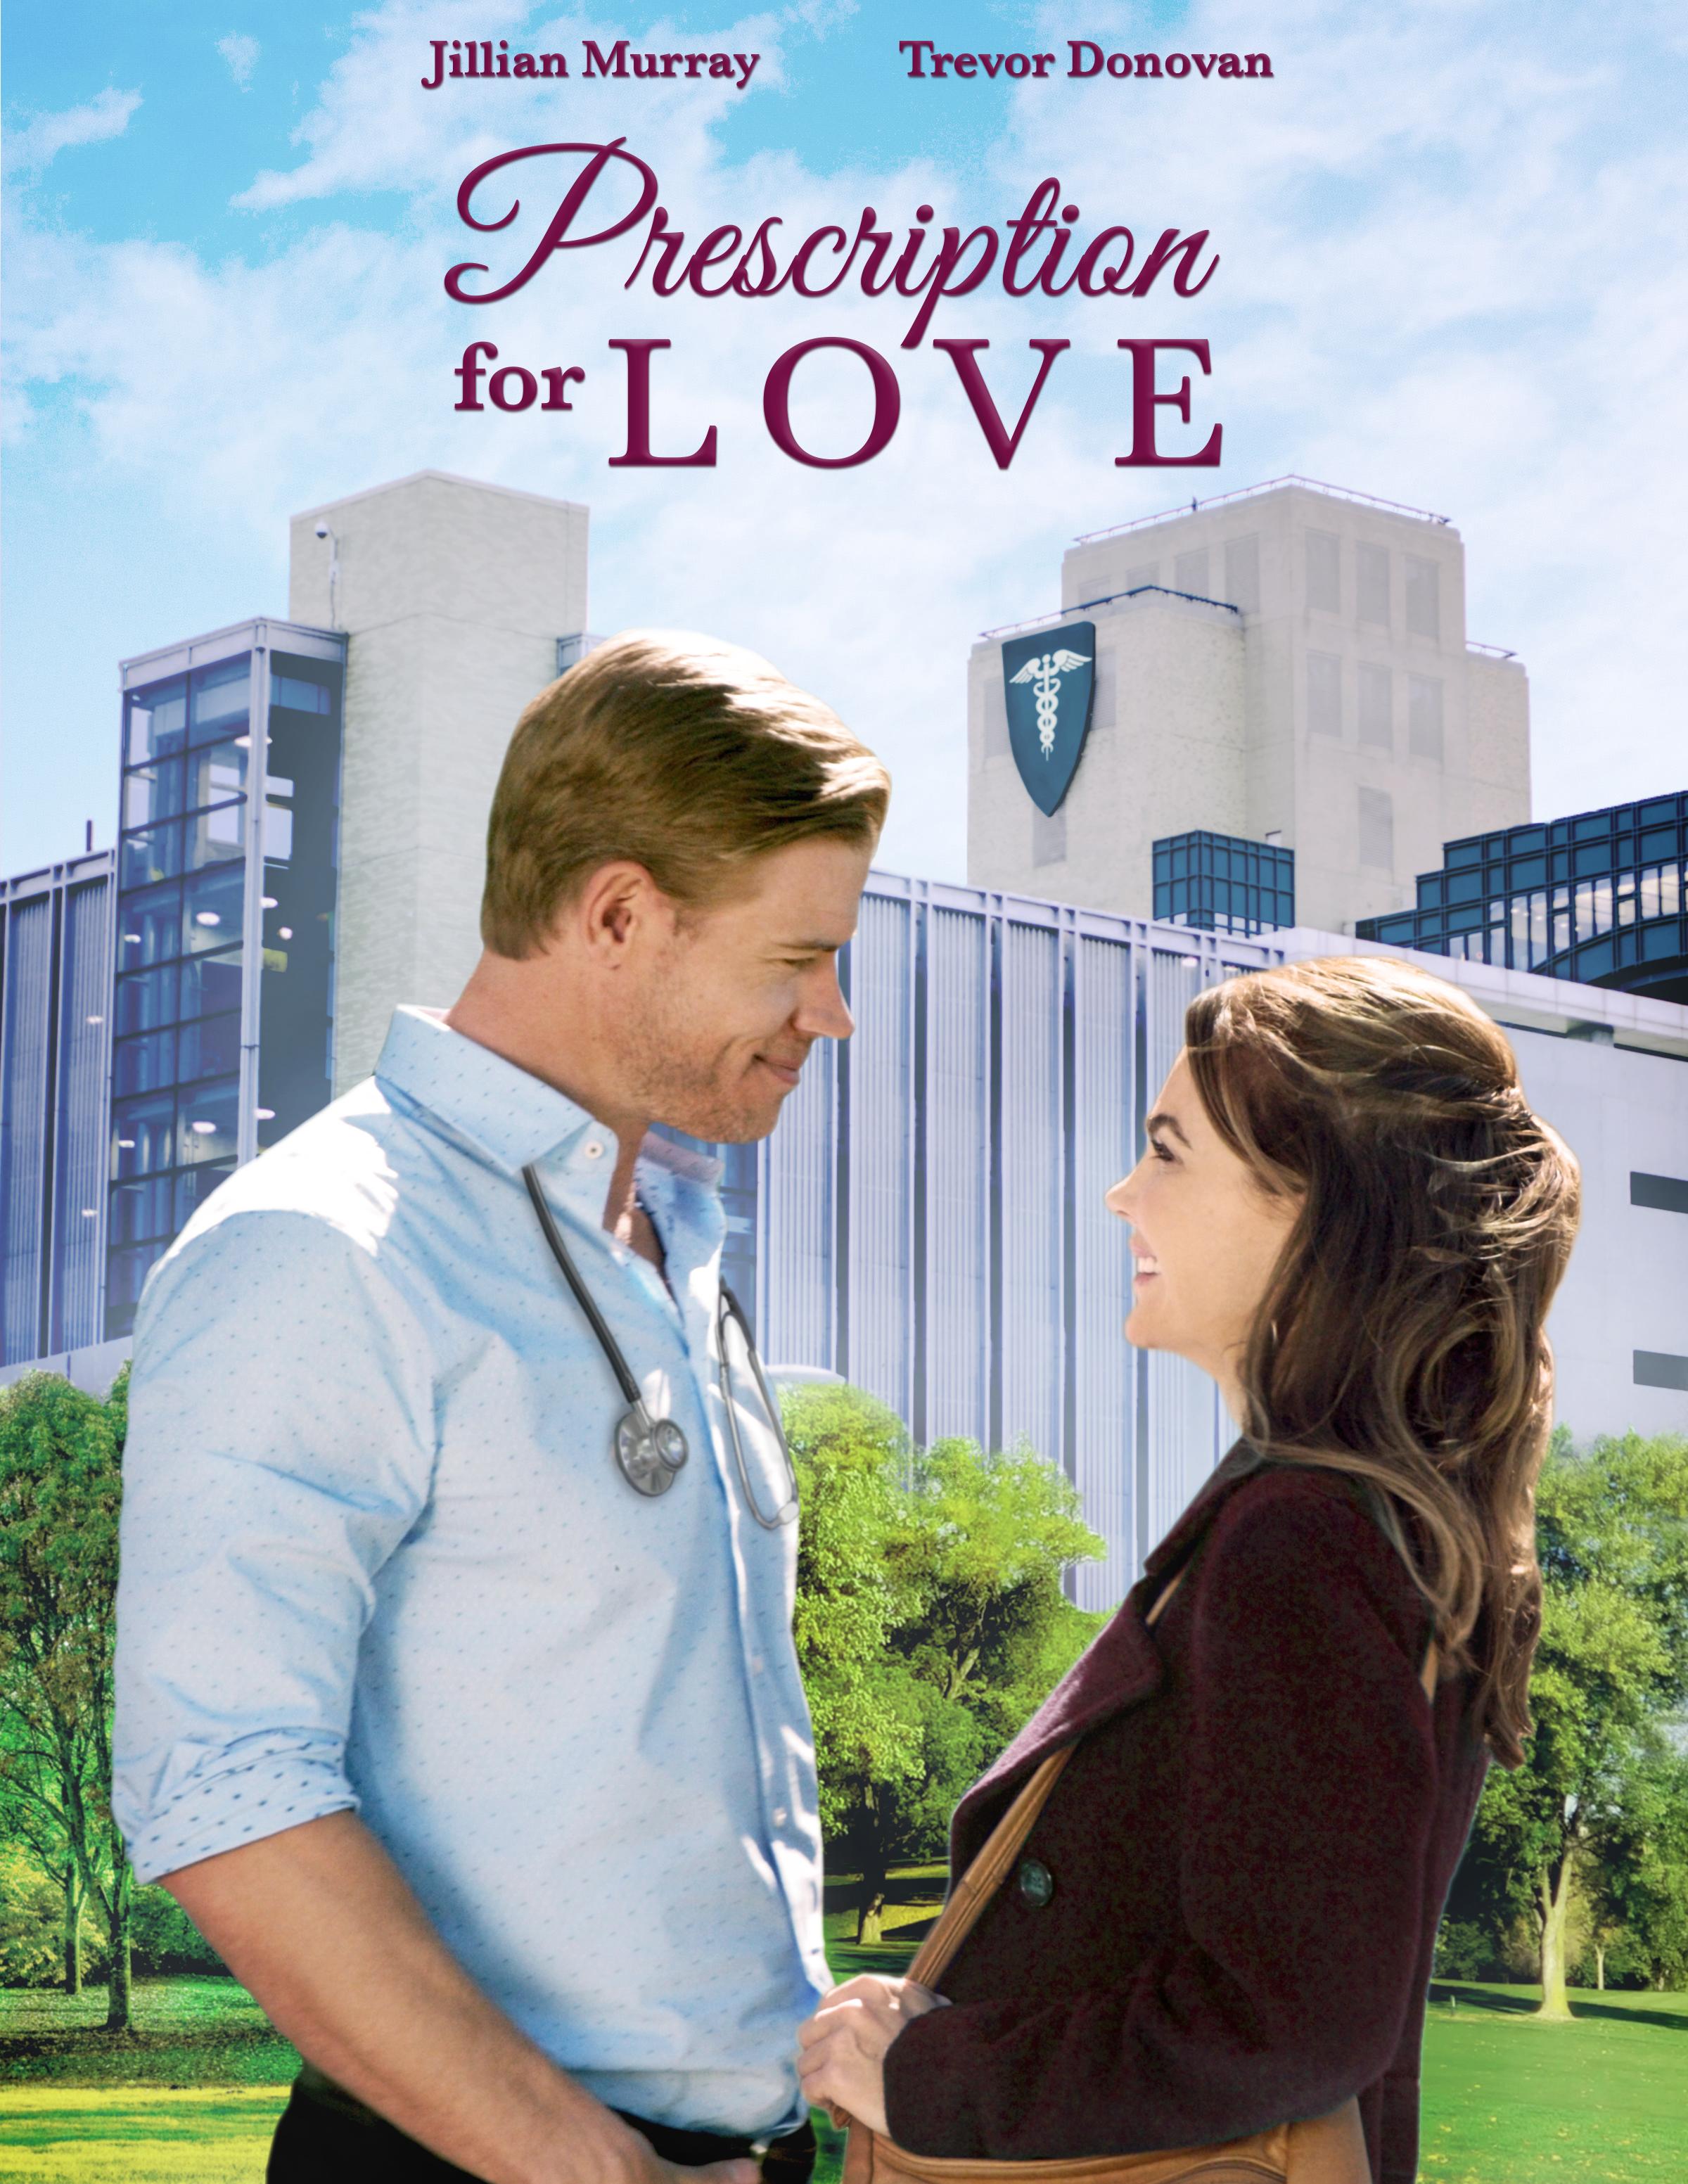 RECEPTAS MEILEI (2019) / Prescription for Love